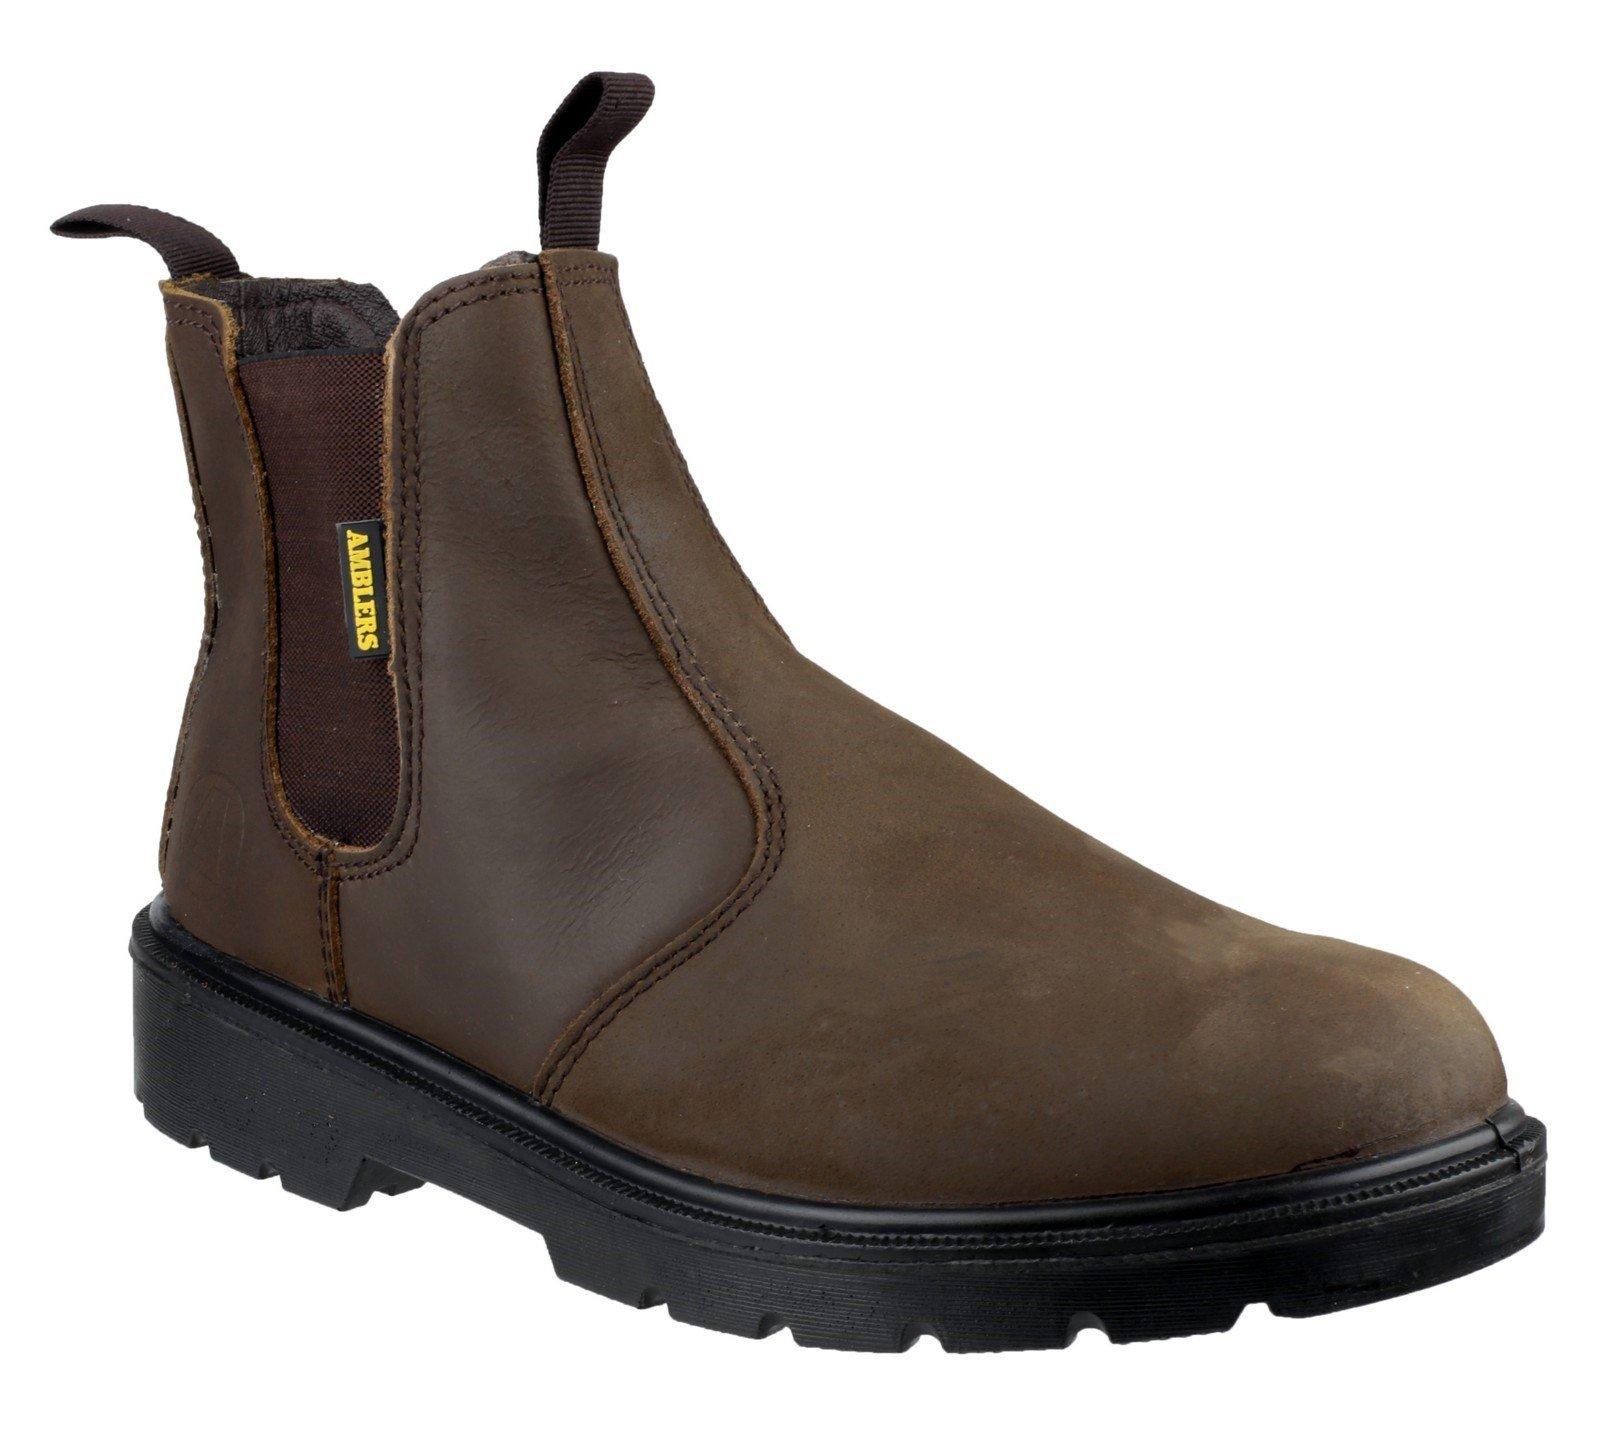 Amblers Unisex Safety Hardwearing Pull On Dealer Boot Brown 15890 - Brown 3